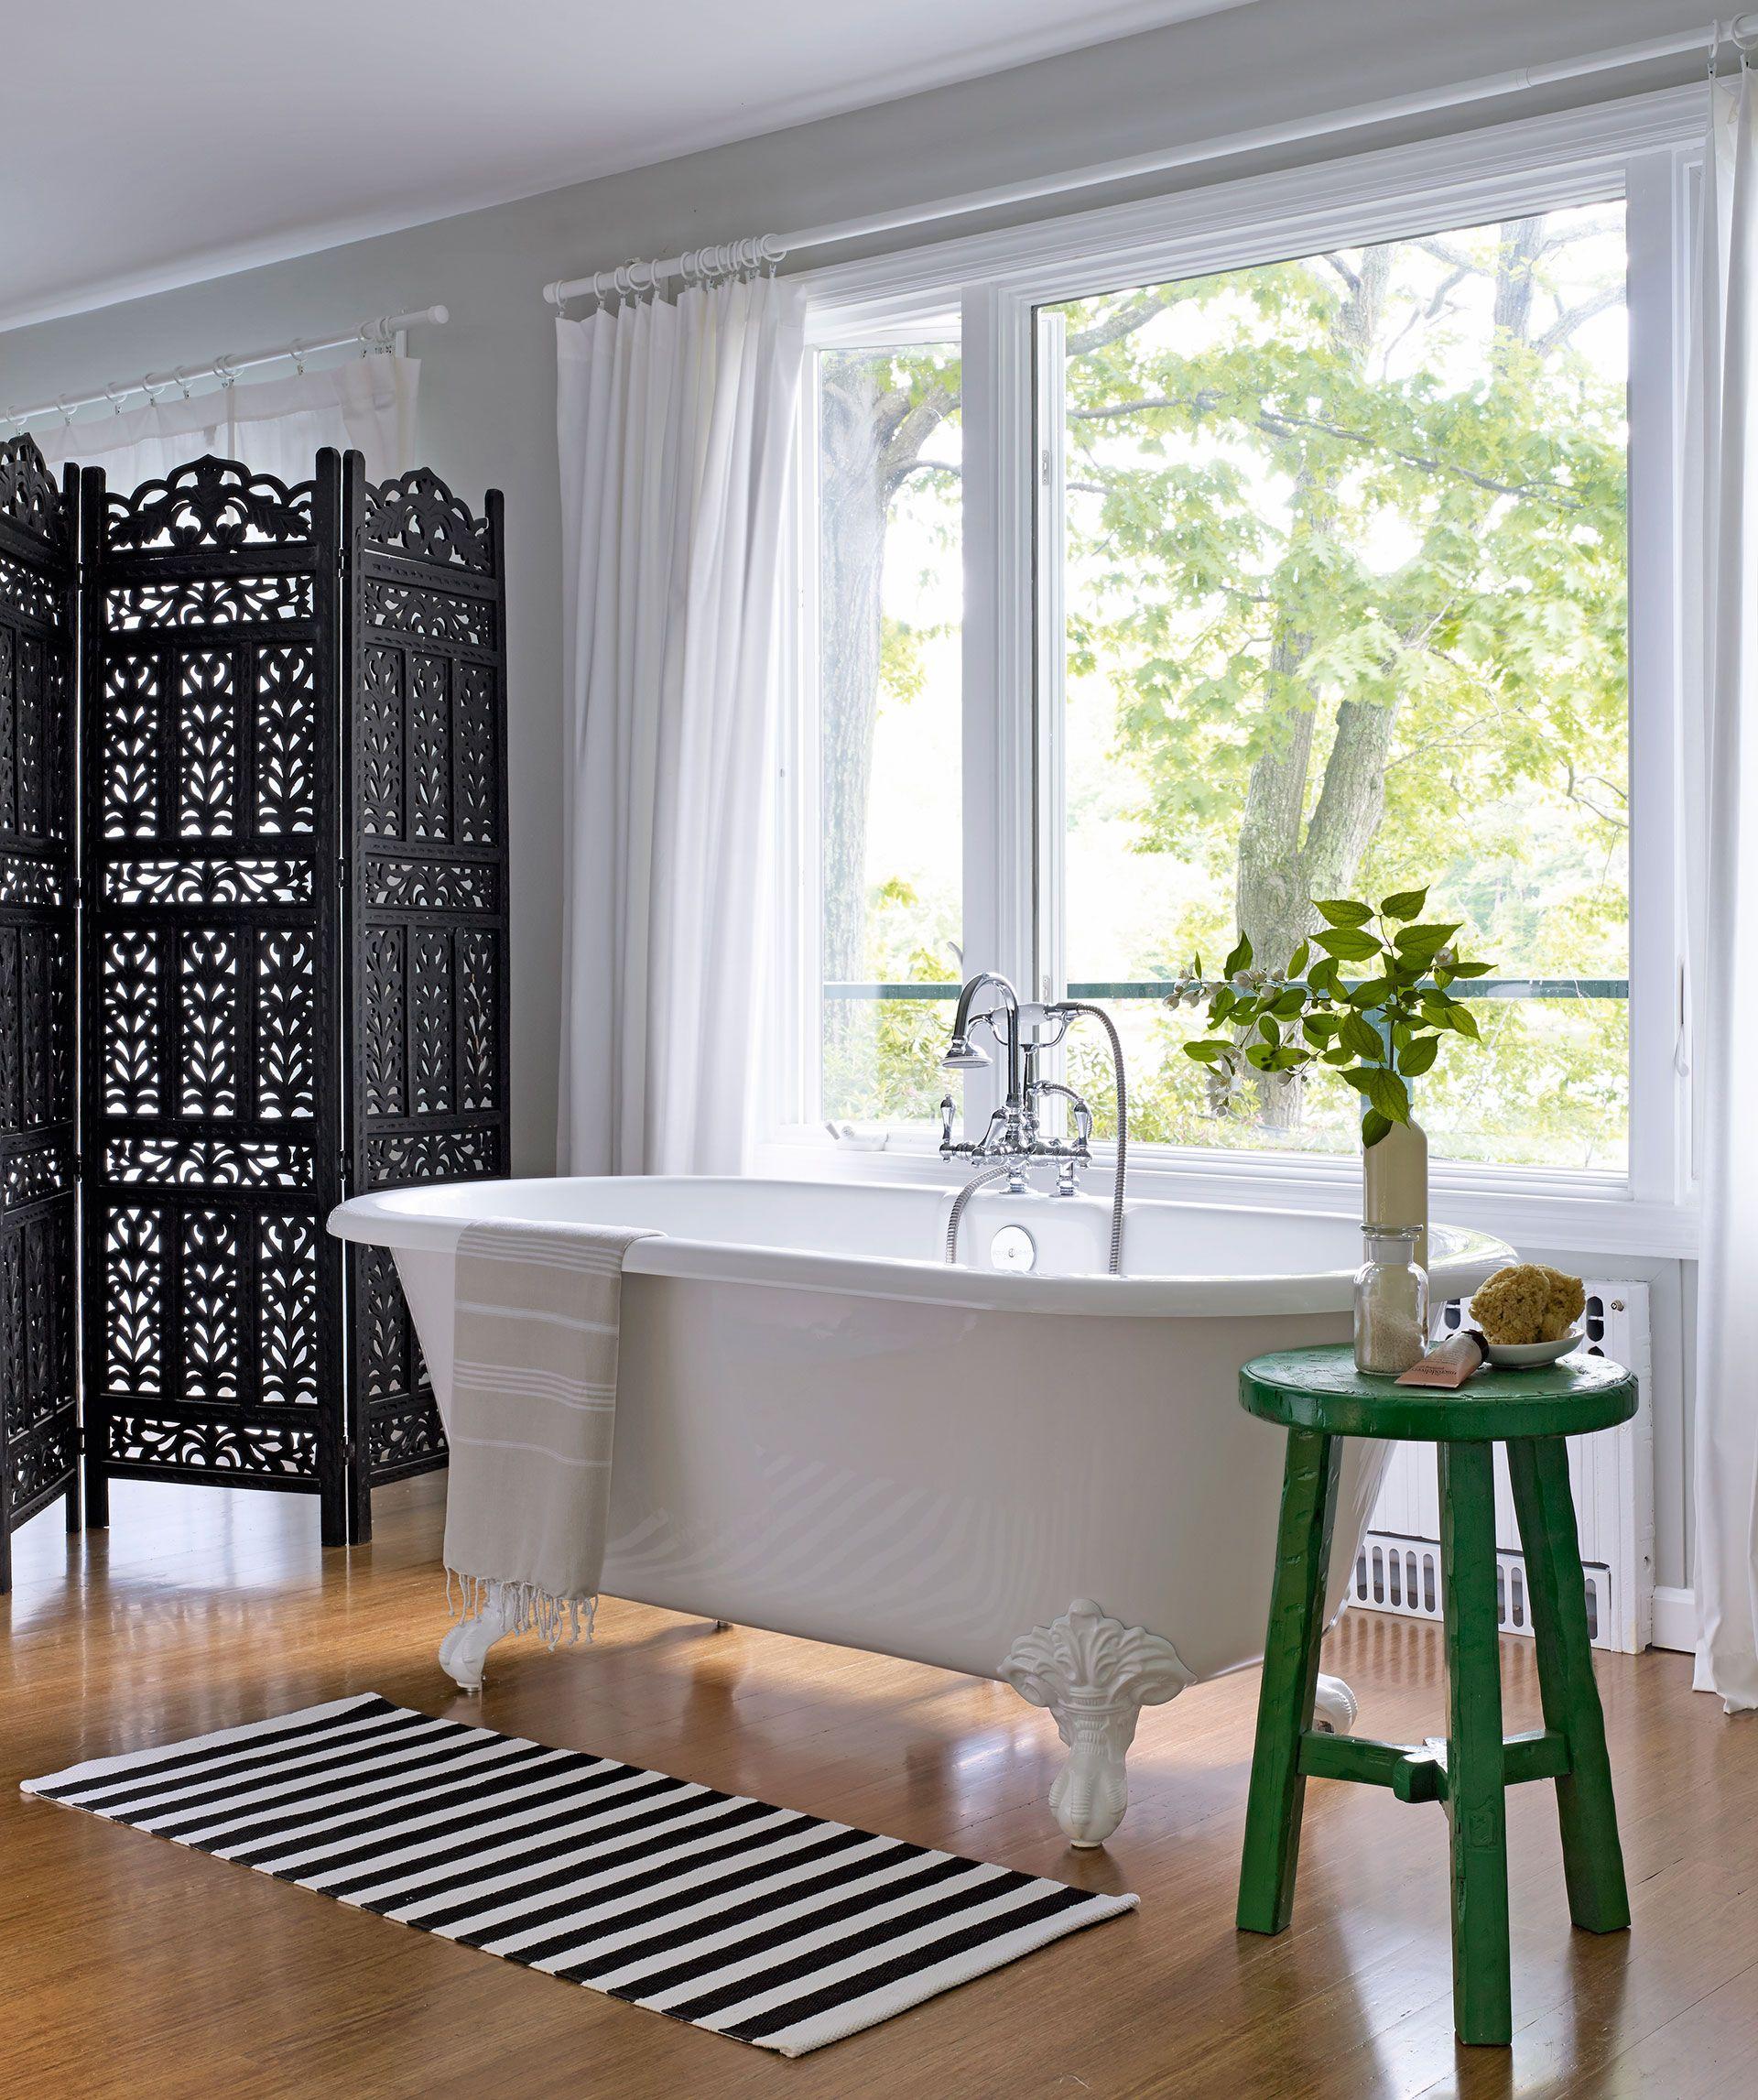 Clawfoot Tub Bathroom Designs Unique 90 Inspiring Bathroom Decorating Ideas  Bathtubs Fancy Houses Design Inspiration